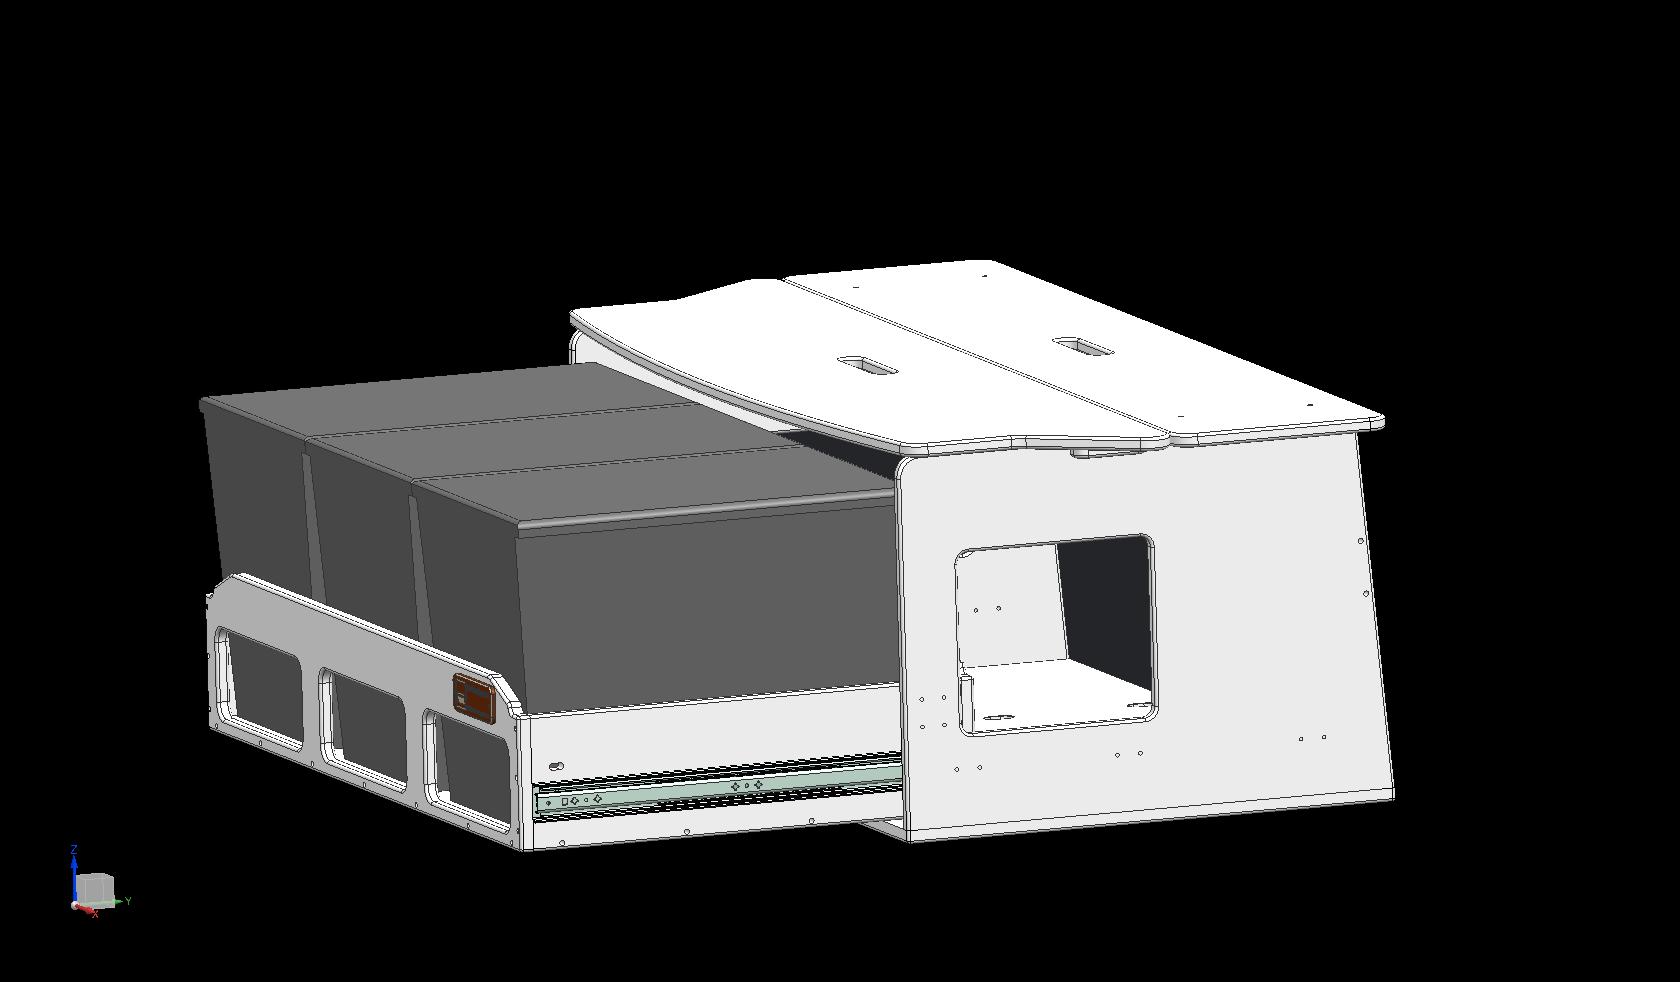 Fahrzeugausbau Camping Multiflexboard Alternative Vw T5 Multivan